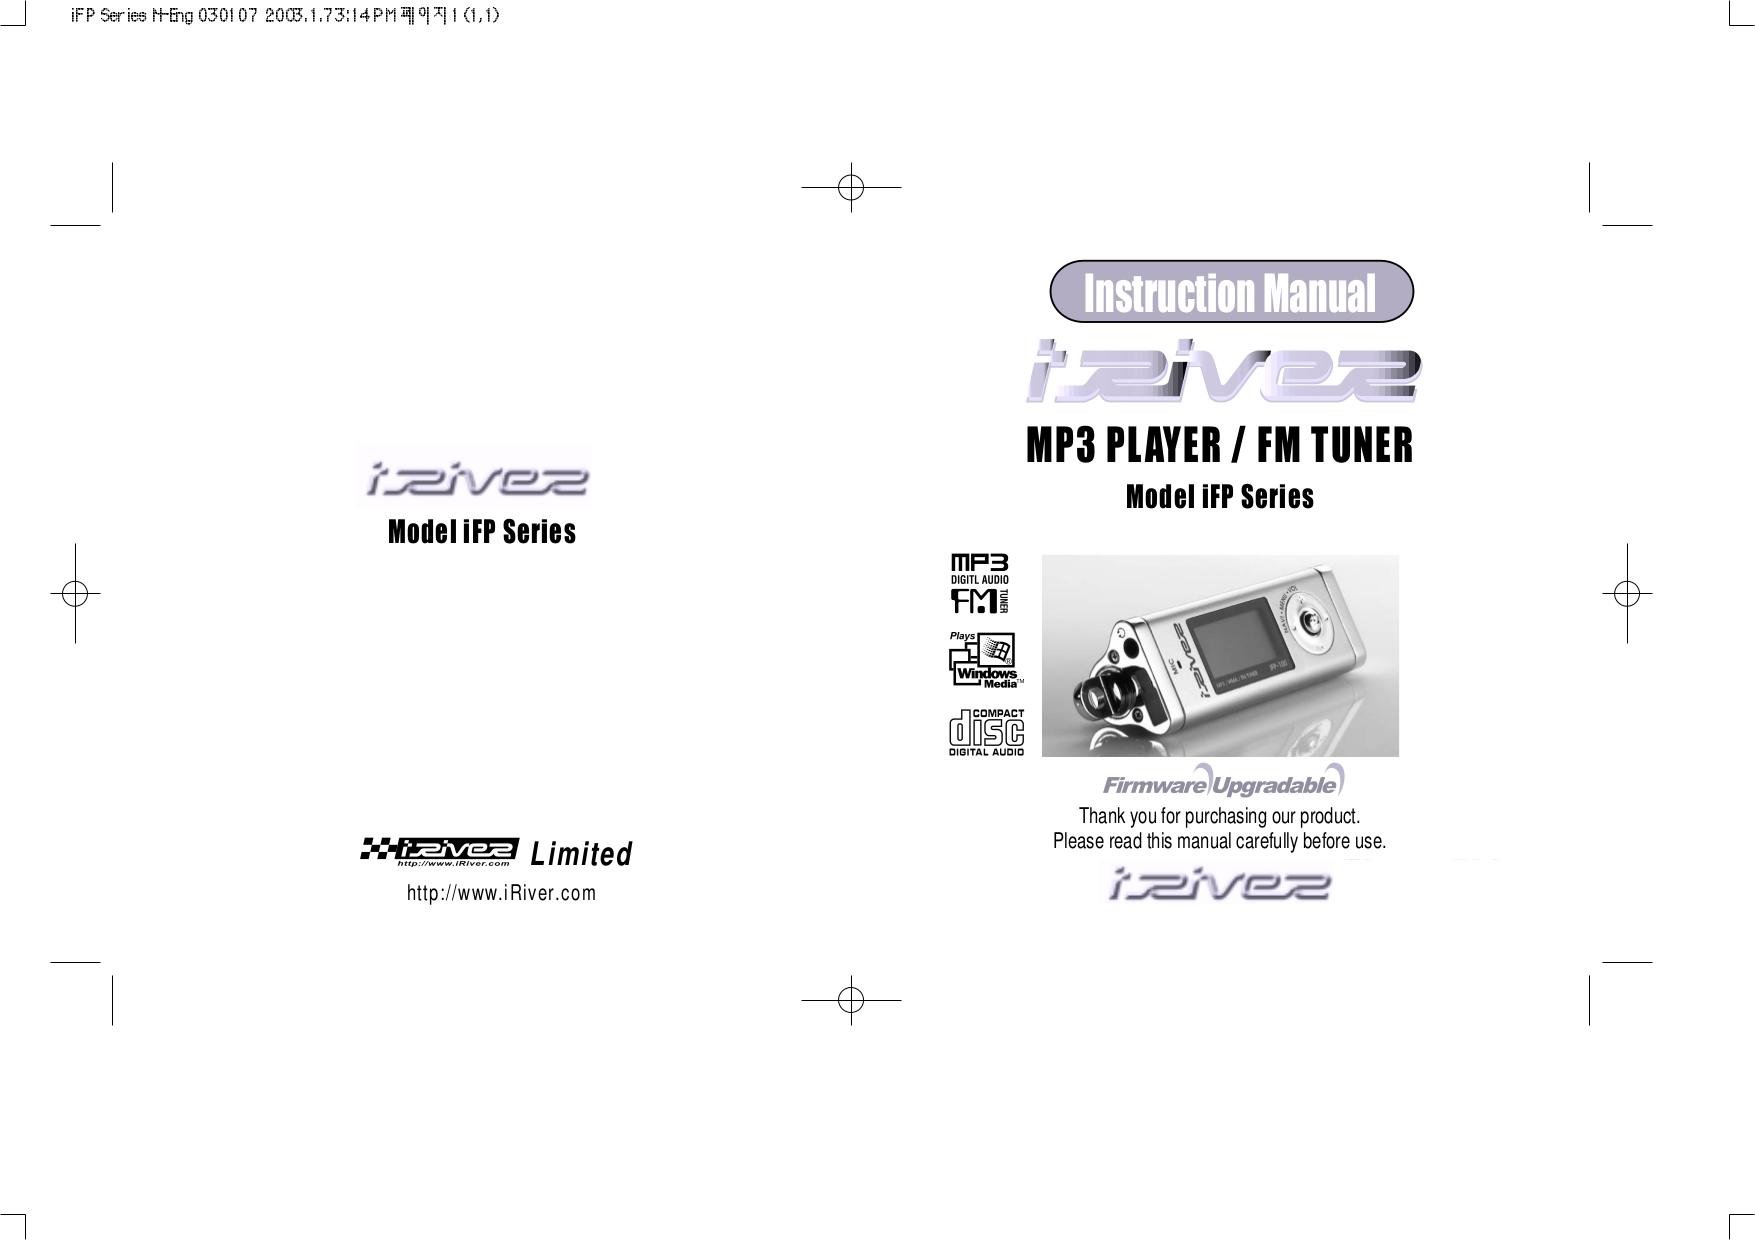 Iriver mp3 player